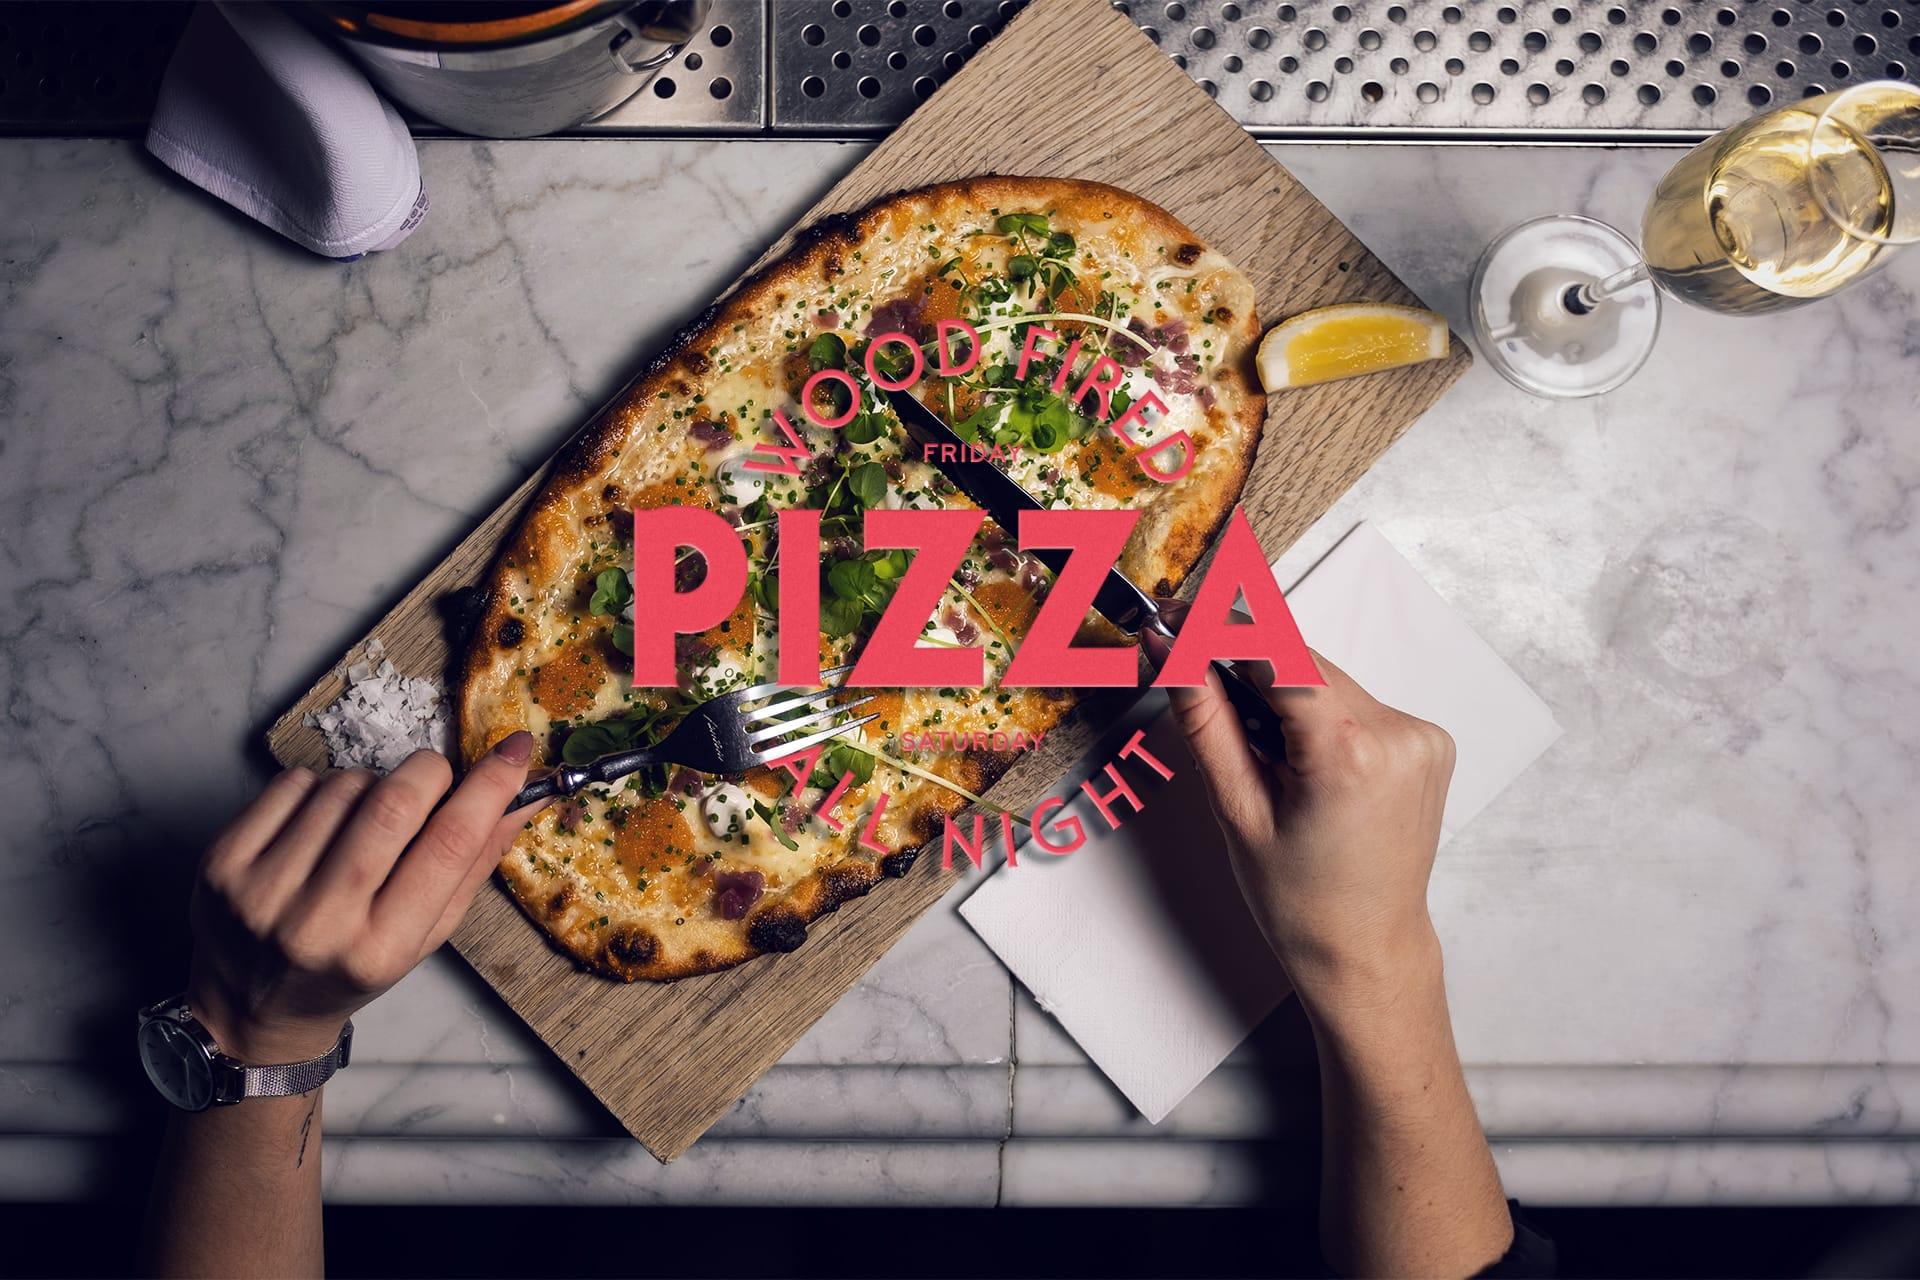 Barabicu_Pizza_mnecander